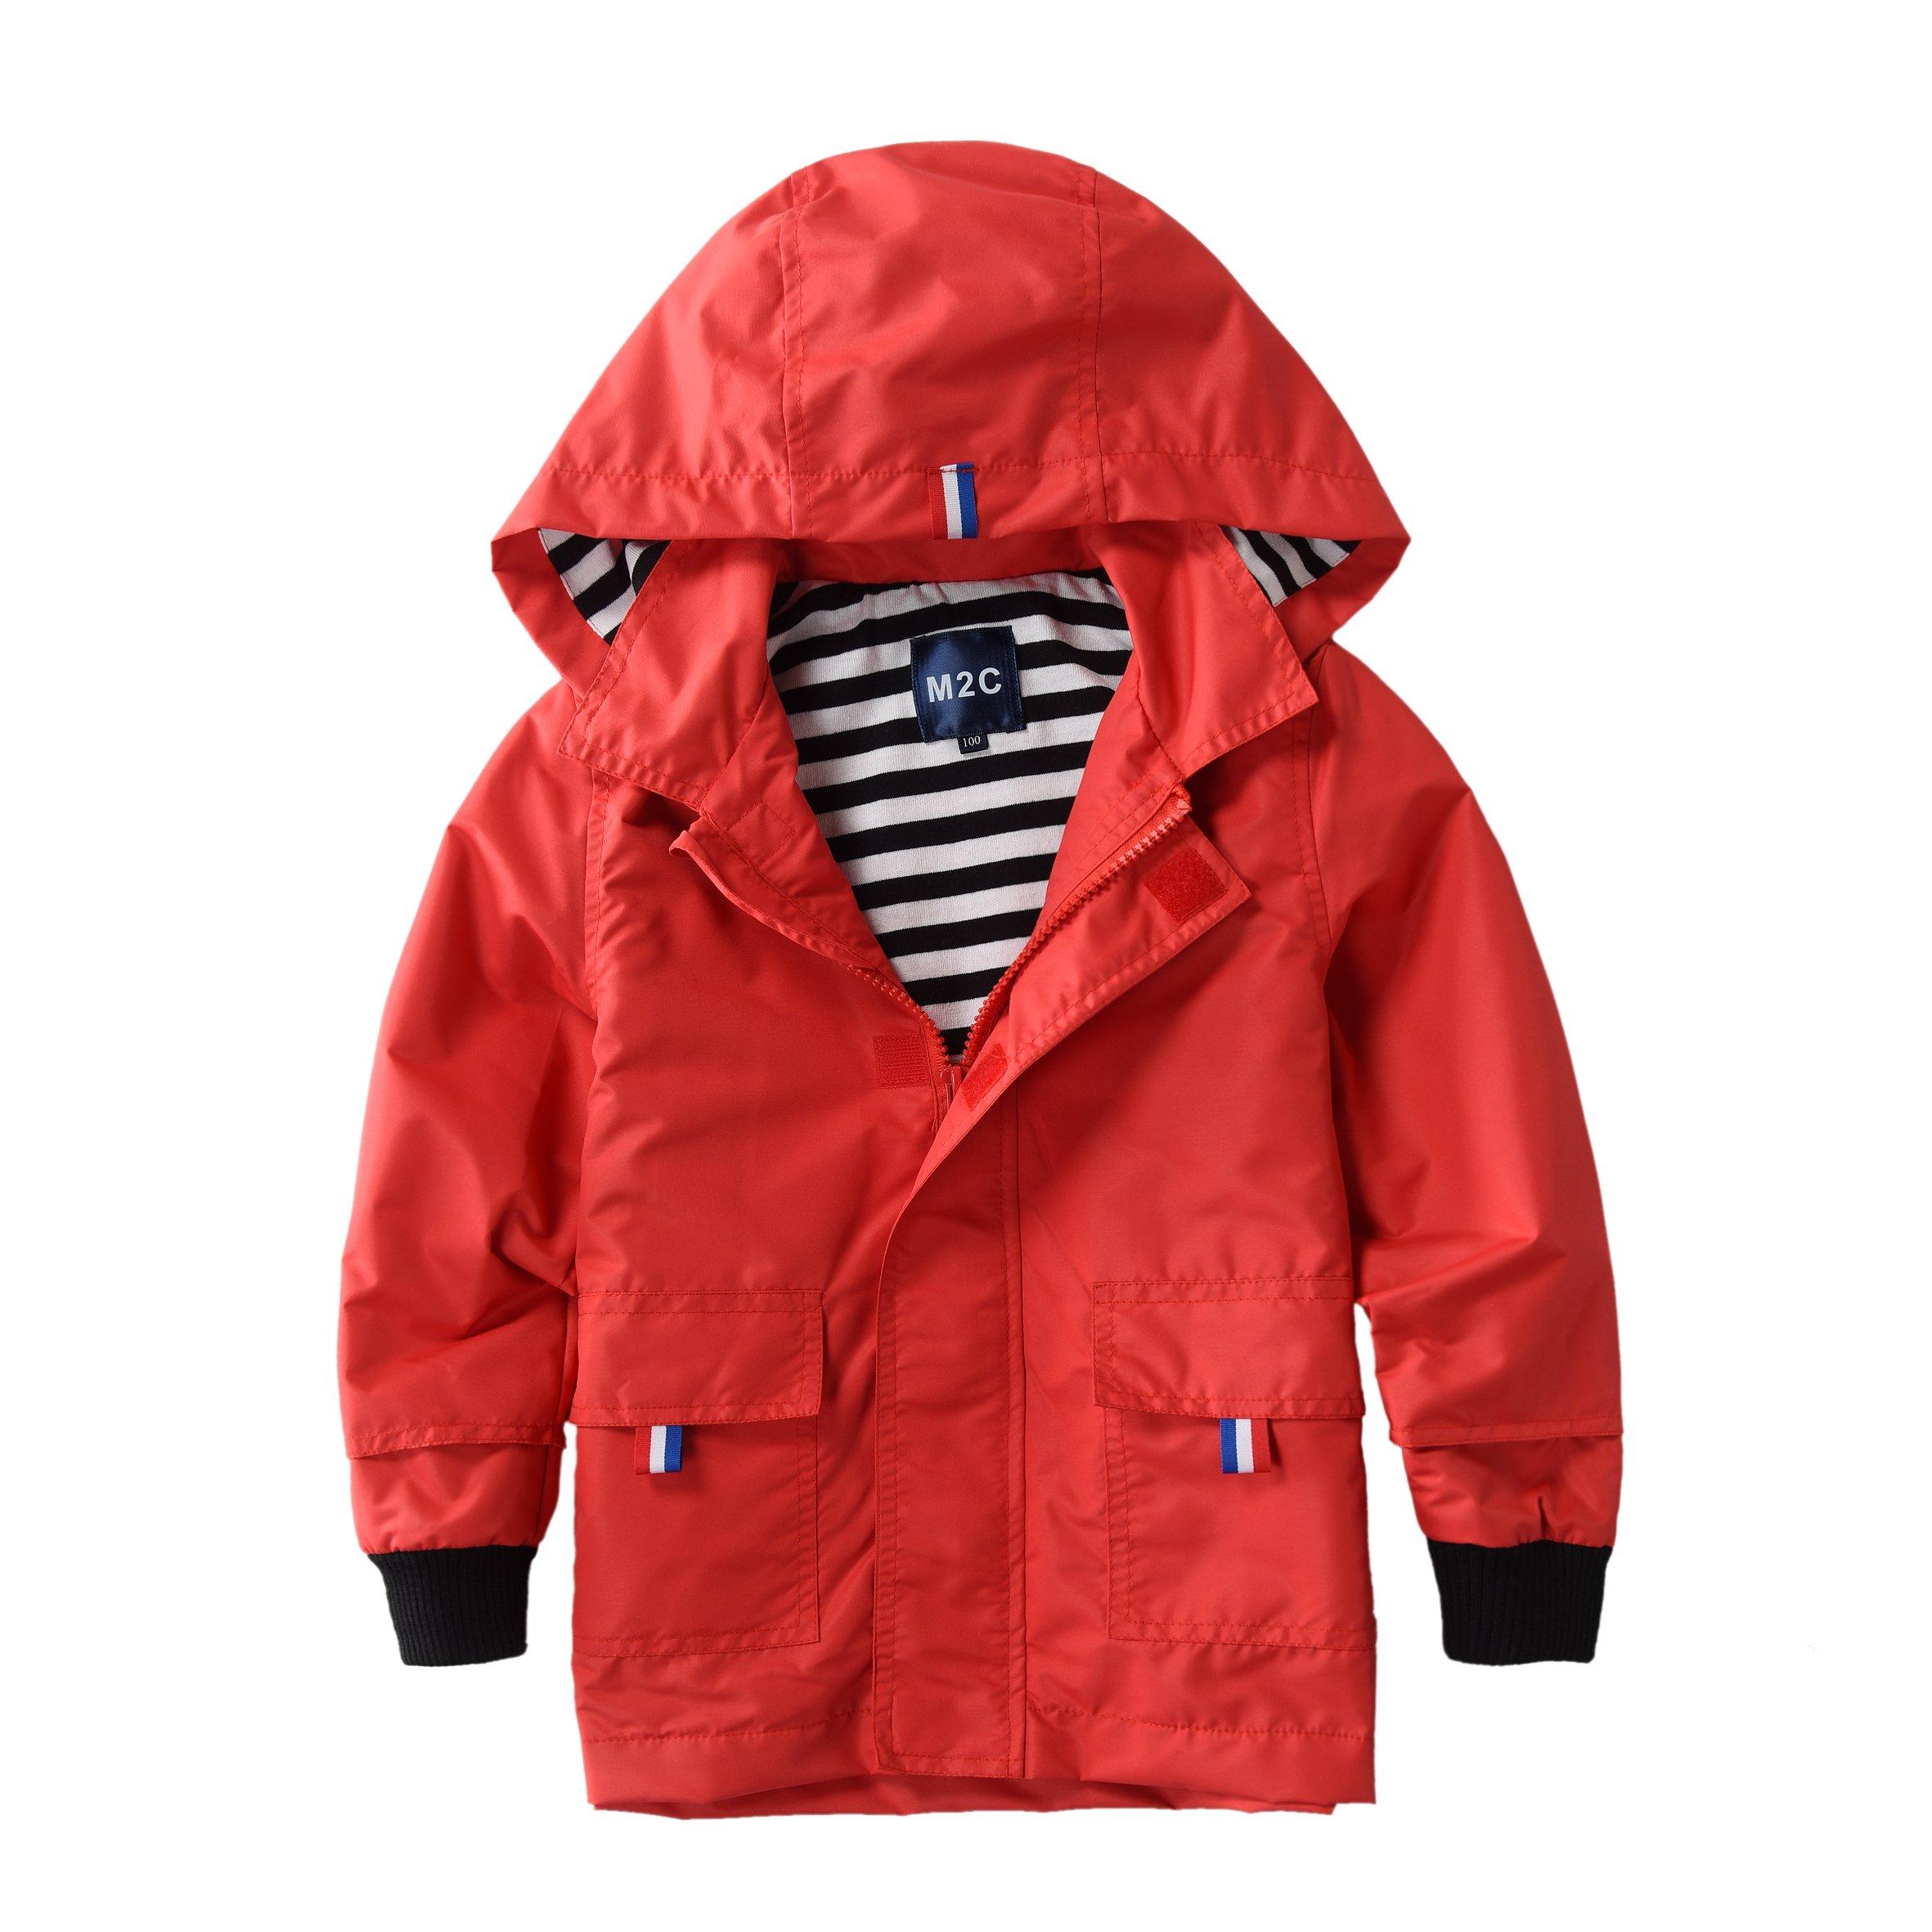 M2C Boys & Girls Raincoat Hooded Jacket Outdoor Light Windbreaker 3T Red